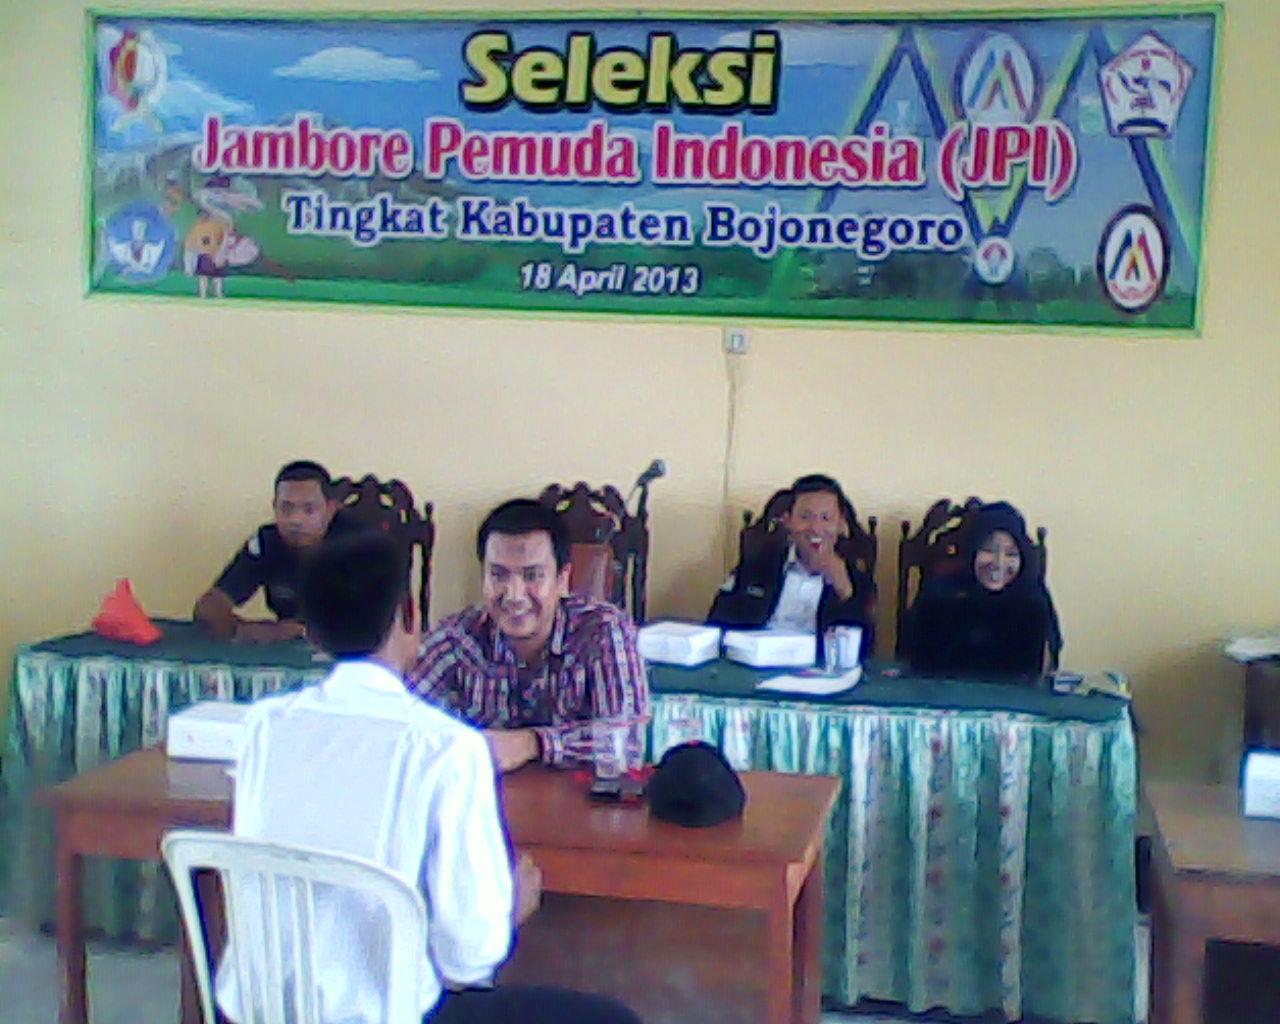 Seleksi JPI tingkat Kabupaten Bojonegoro tahun 2013